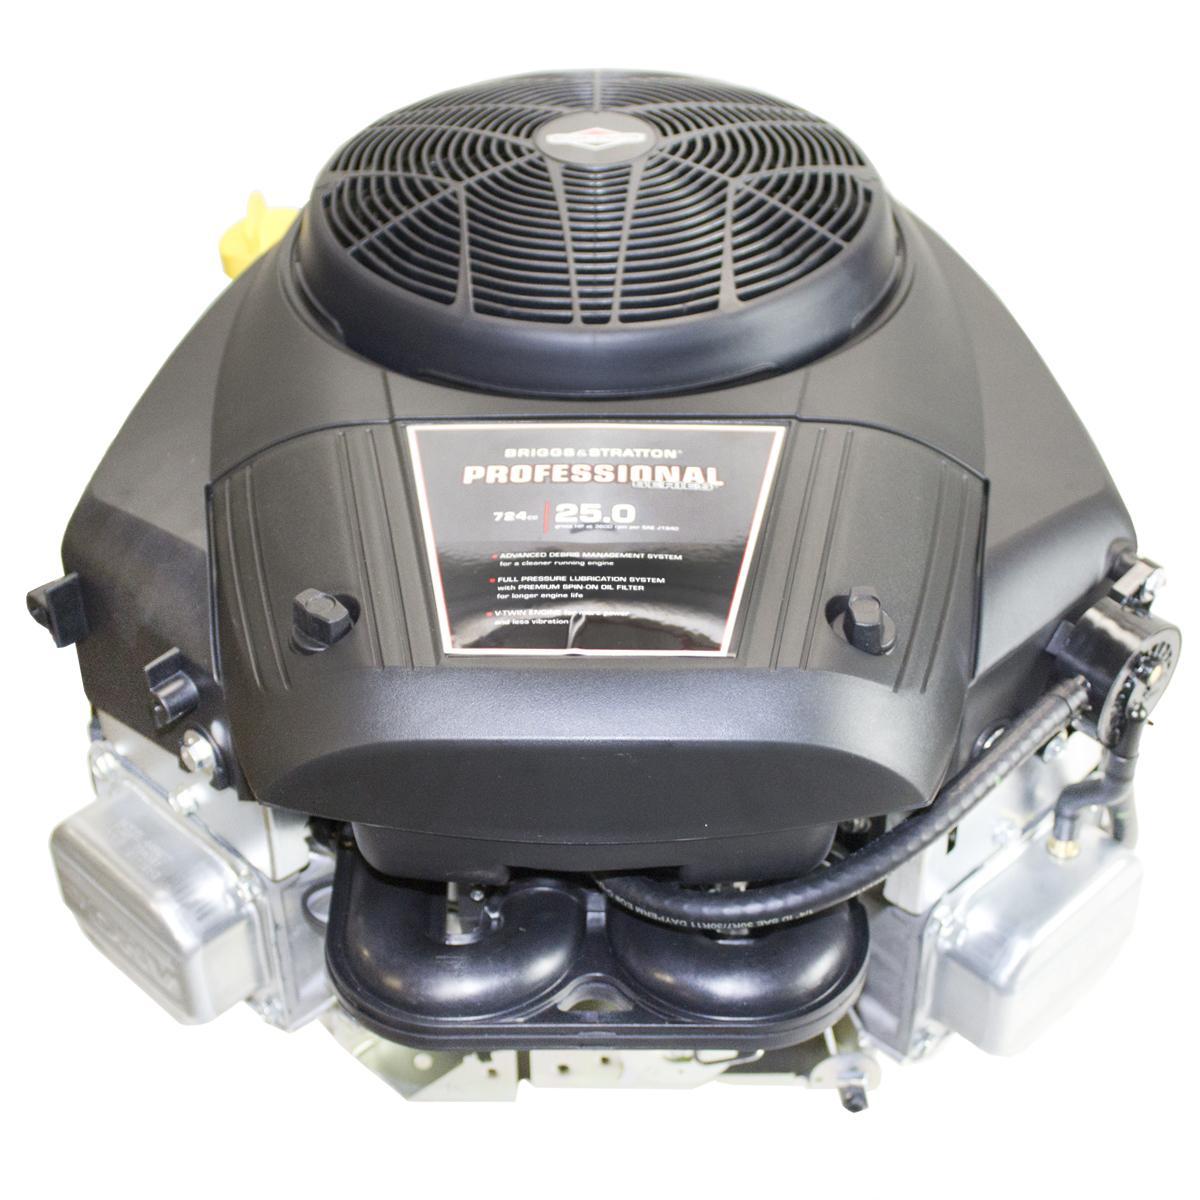 "25hp Professional Vertical 1-1/8""x4-5/16"" Keyed Shaft, Fuel Pump, Electric Start, 16 Amp Alt, Briggs & Stratton Engine"